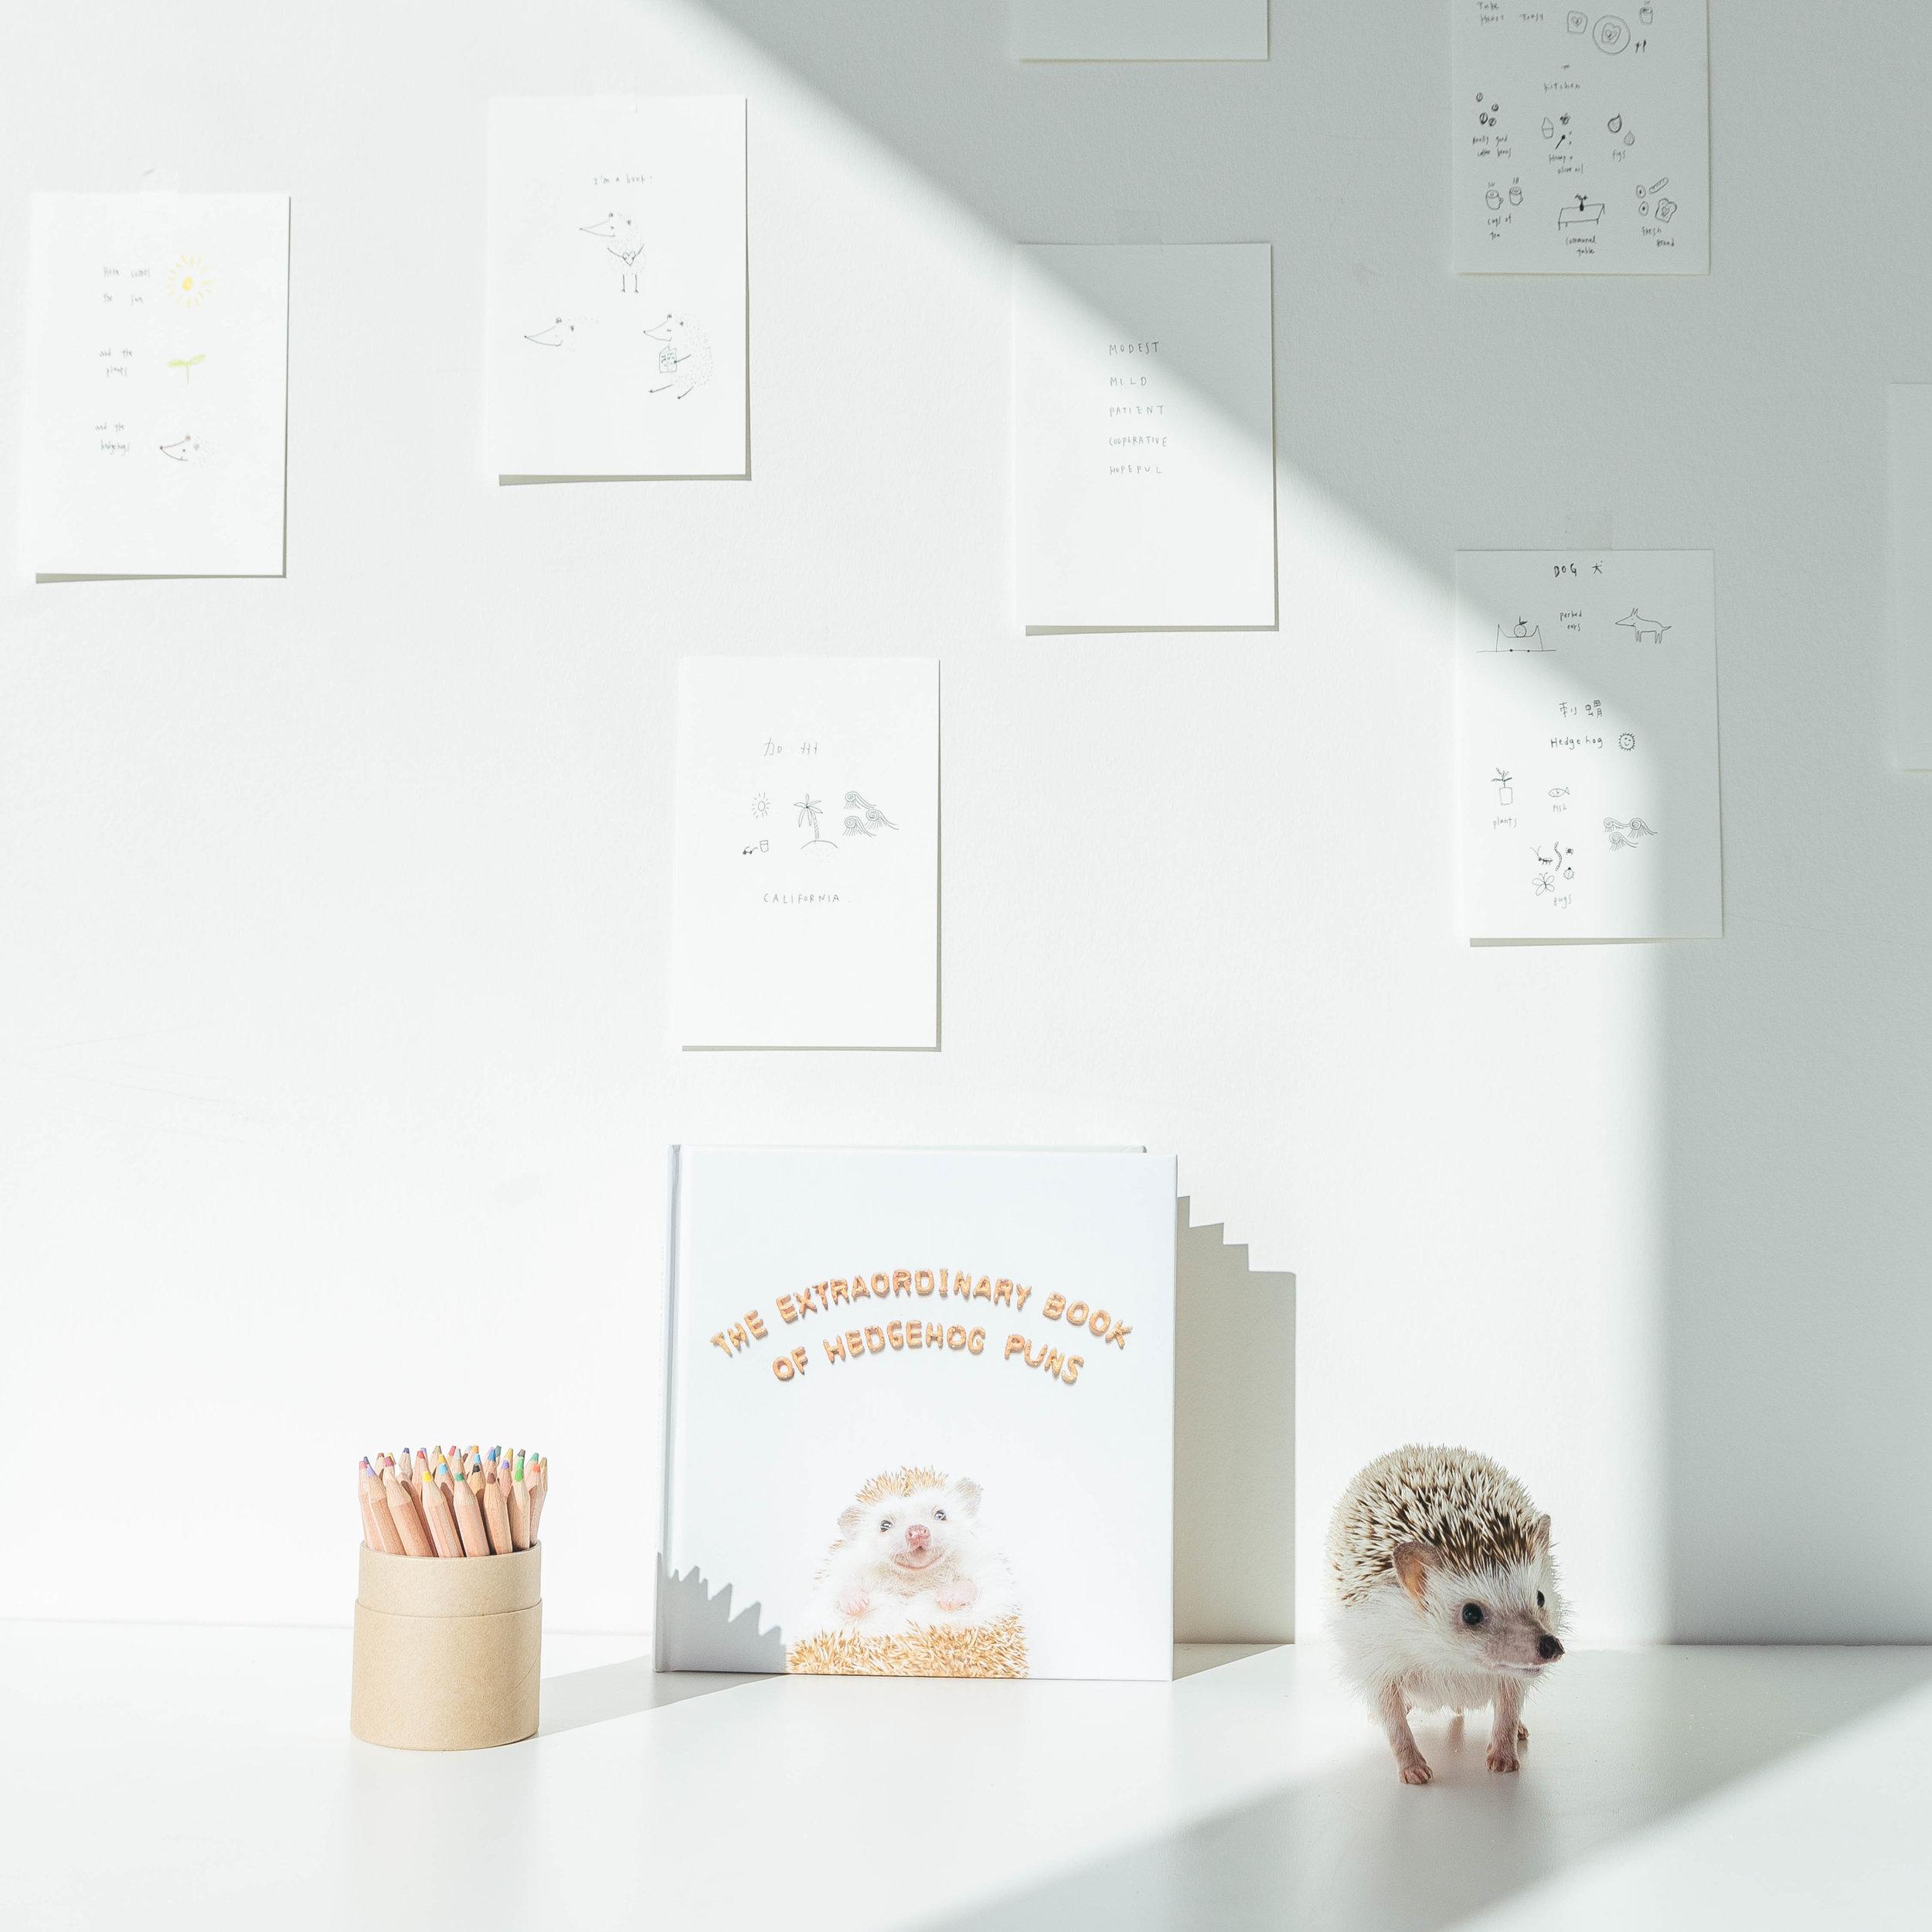 amelia-hedgehog-muji-canada-sophia-hsin-5.jpg